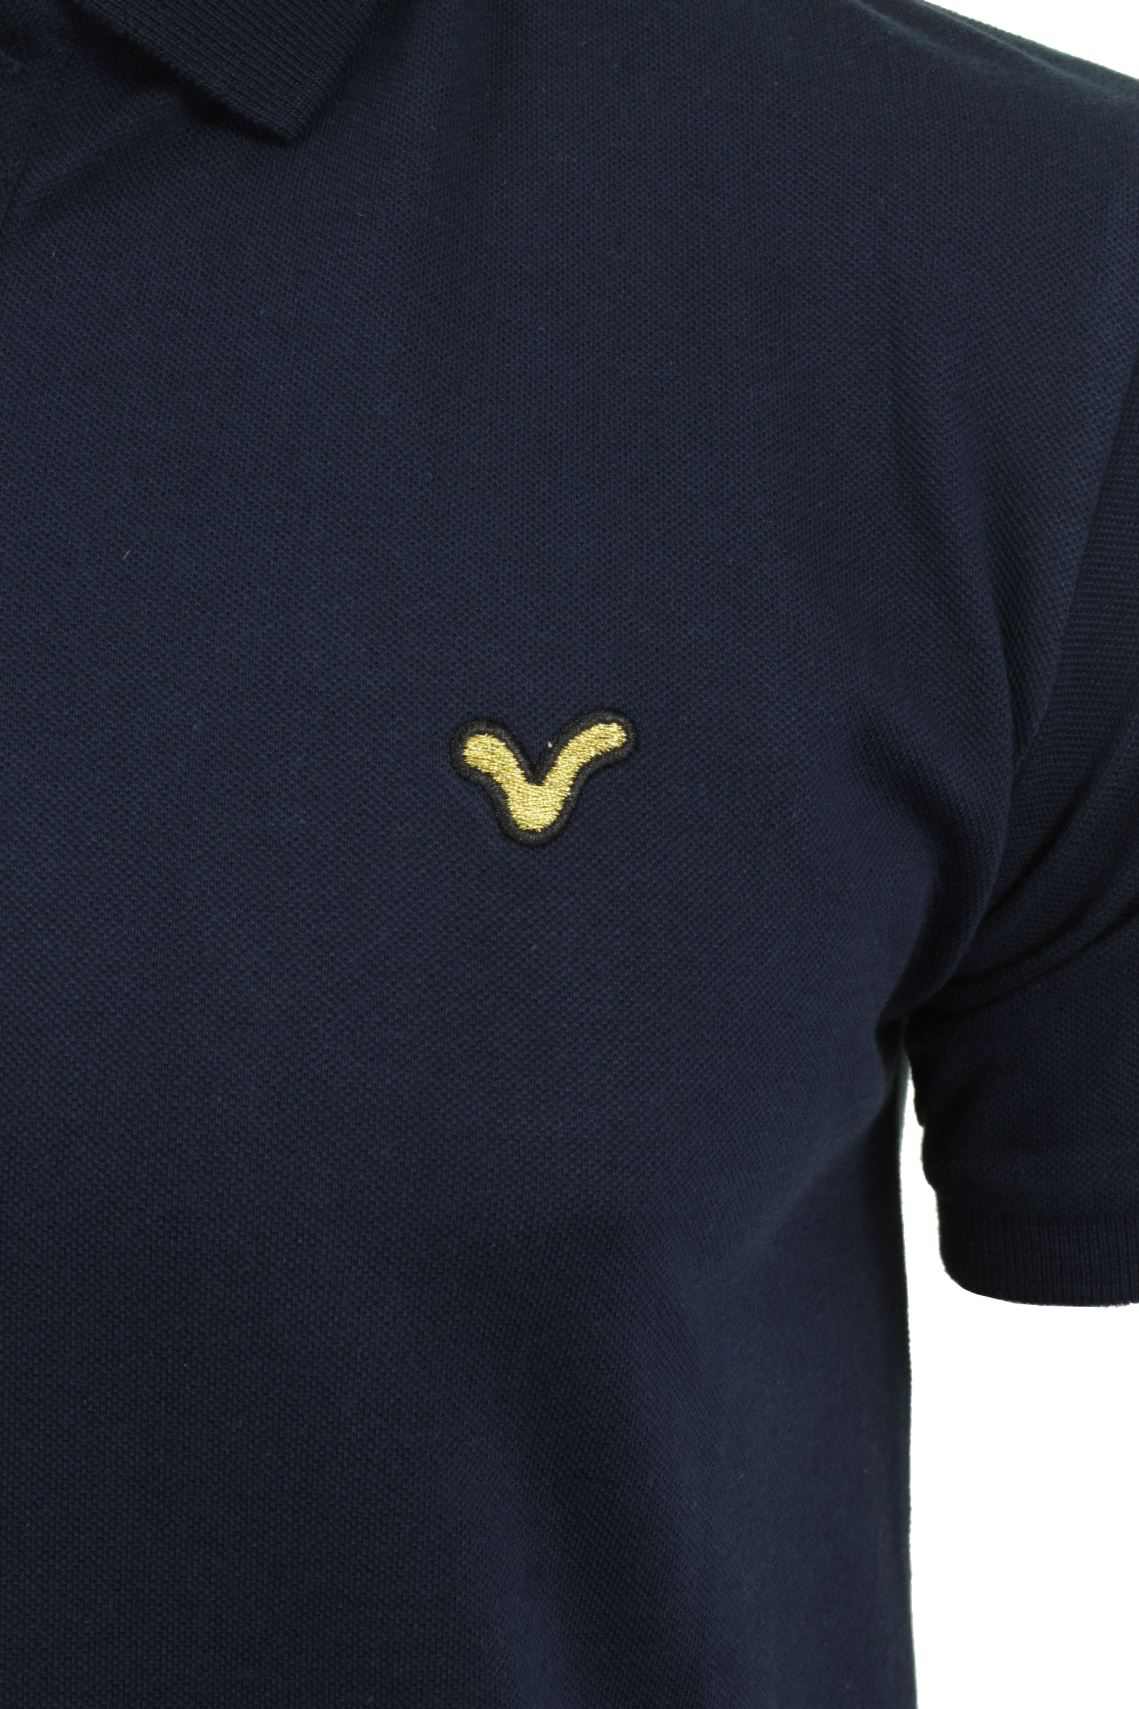 Camisa-Polo-para-hombre-Voi-Jeans-Redford-de-manga-corta-de-moda miniatura 4